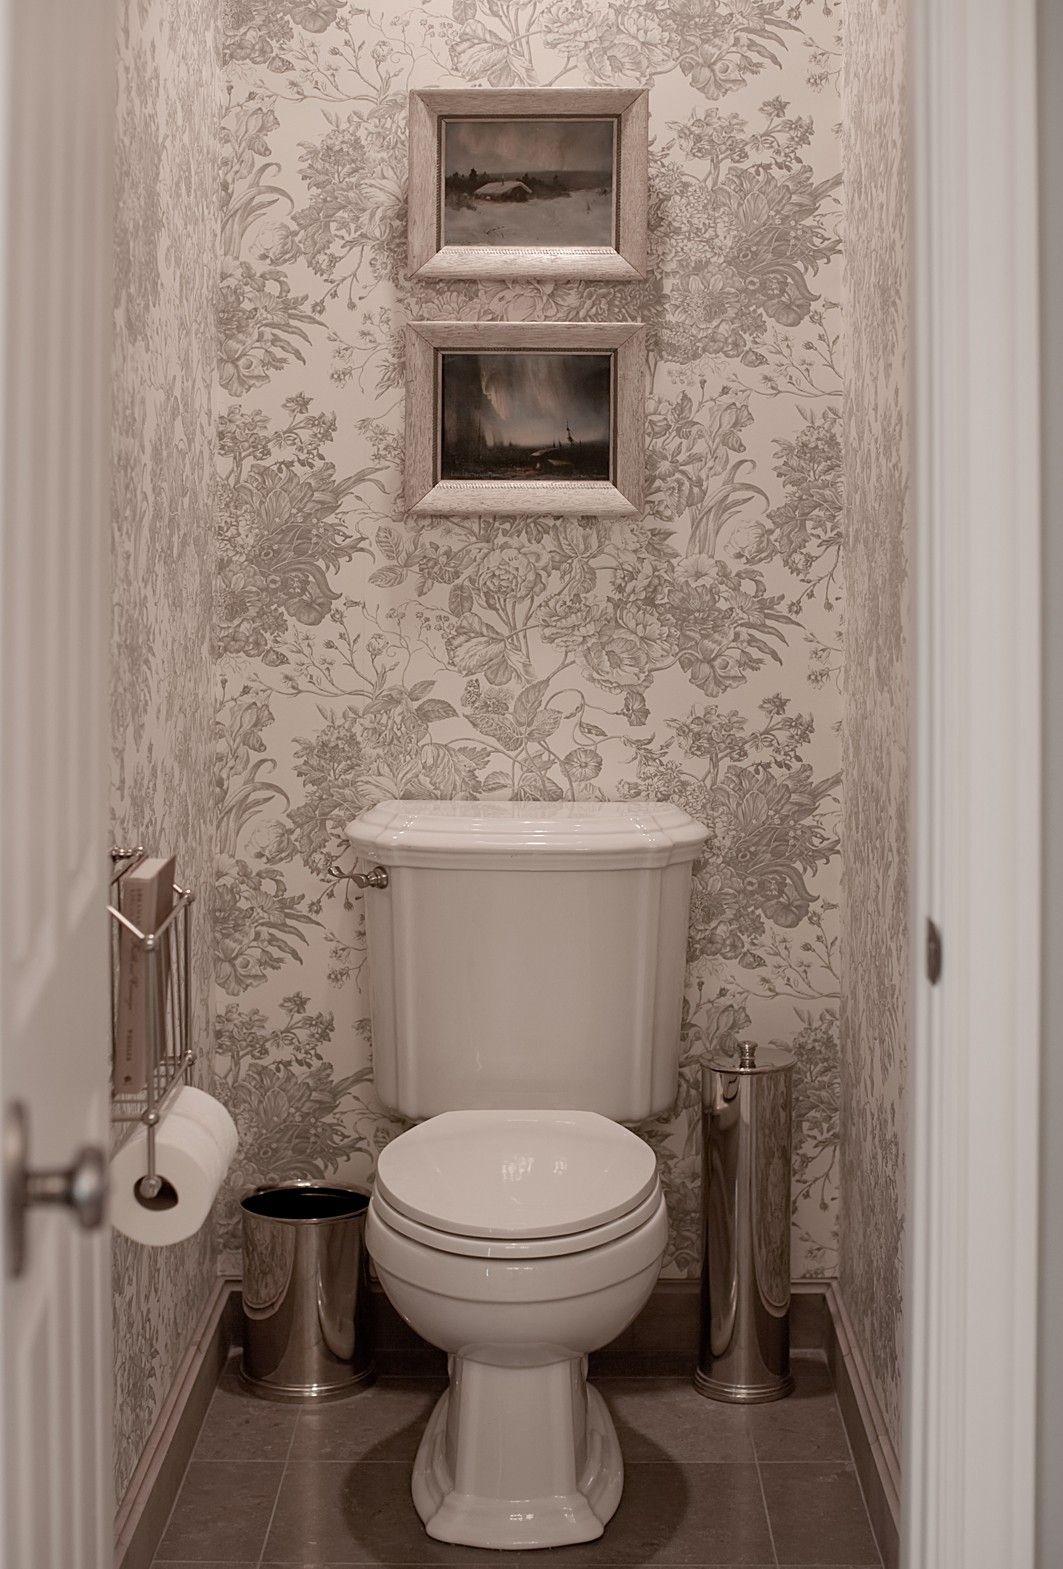 Best Pin By Jamison Vandyke On Goddard Road Home Toilet 640 x 480